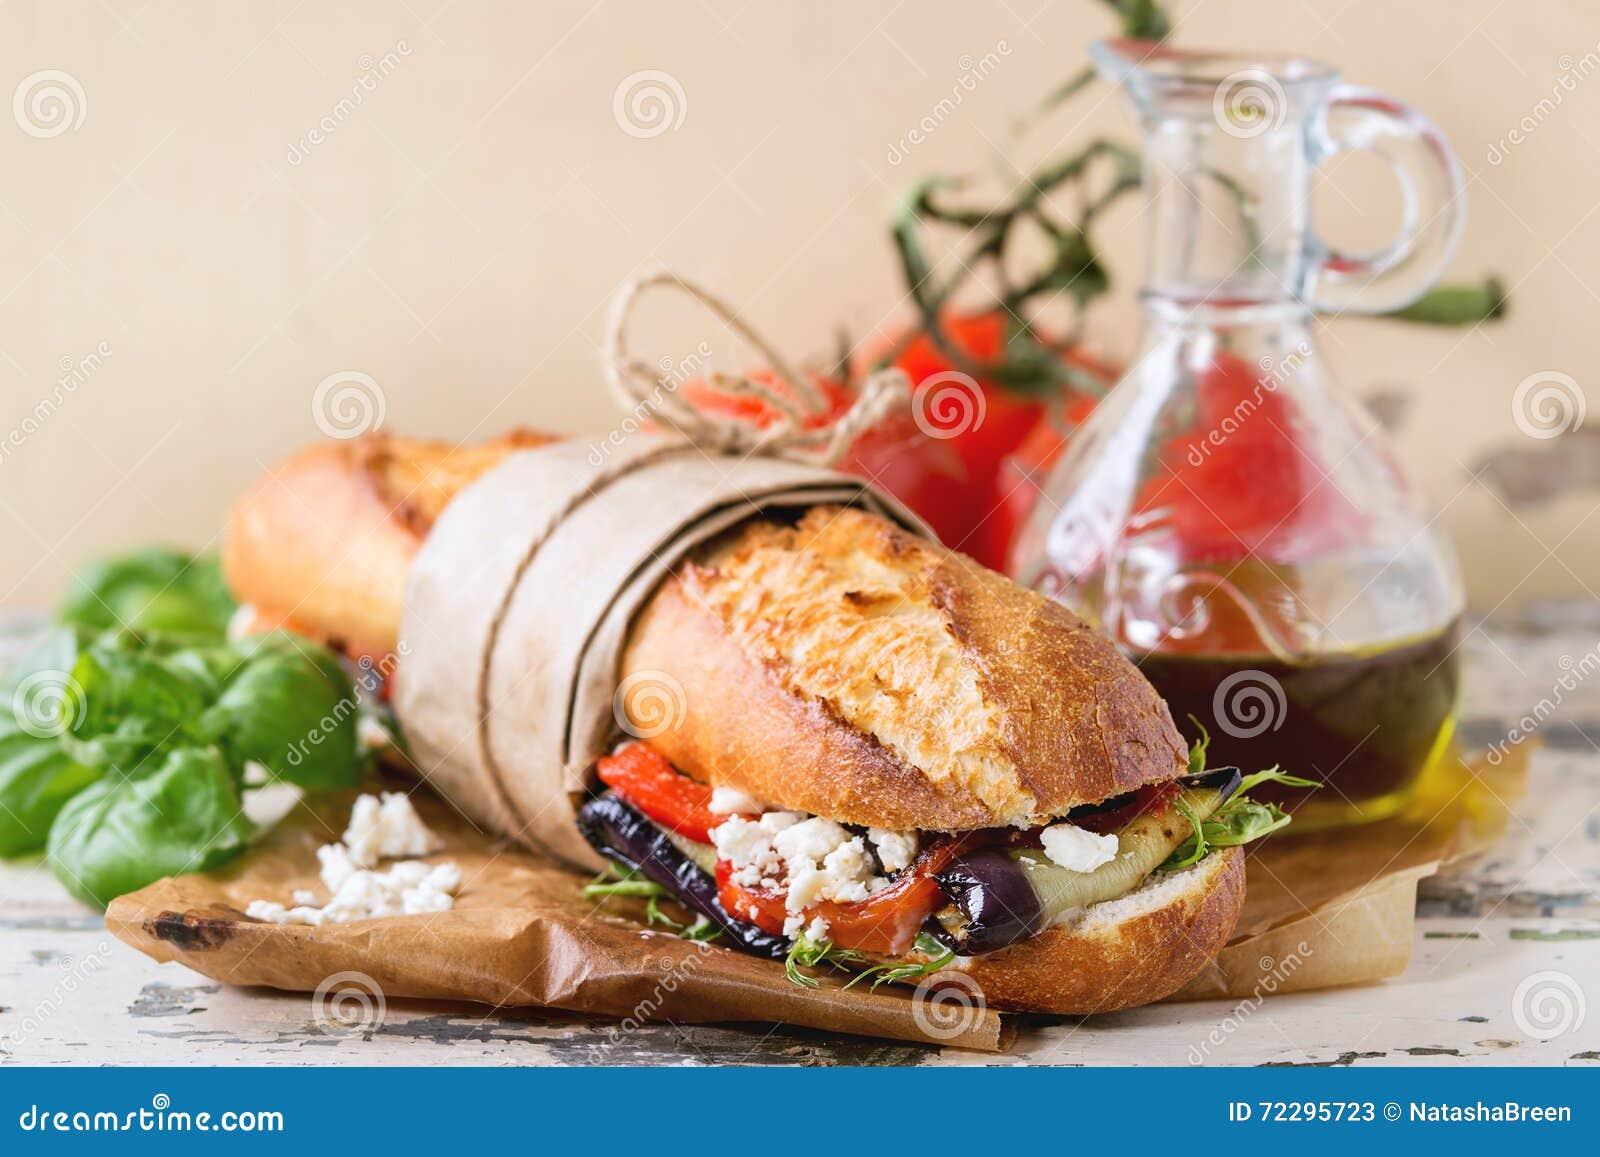 Download Вегетарианский сандвич багета Стоковое Изображение - изображение насчитывающей перец, сыр: 72295723